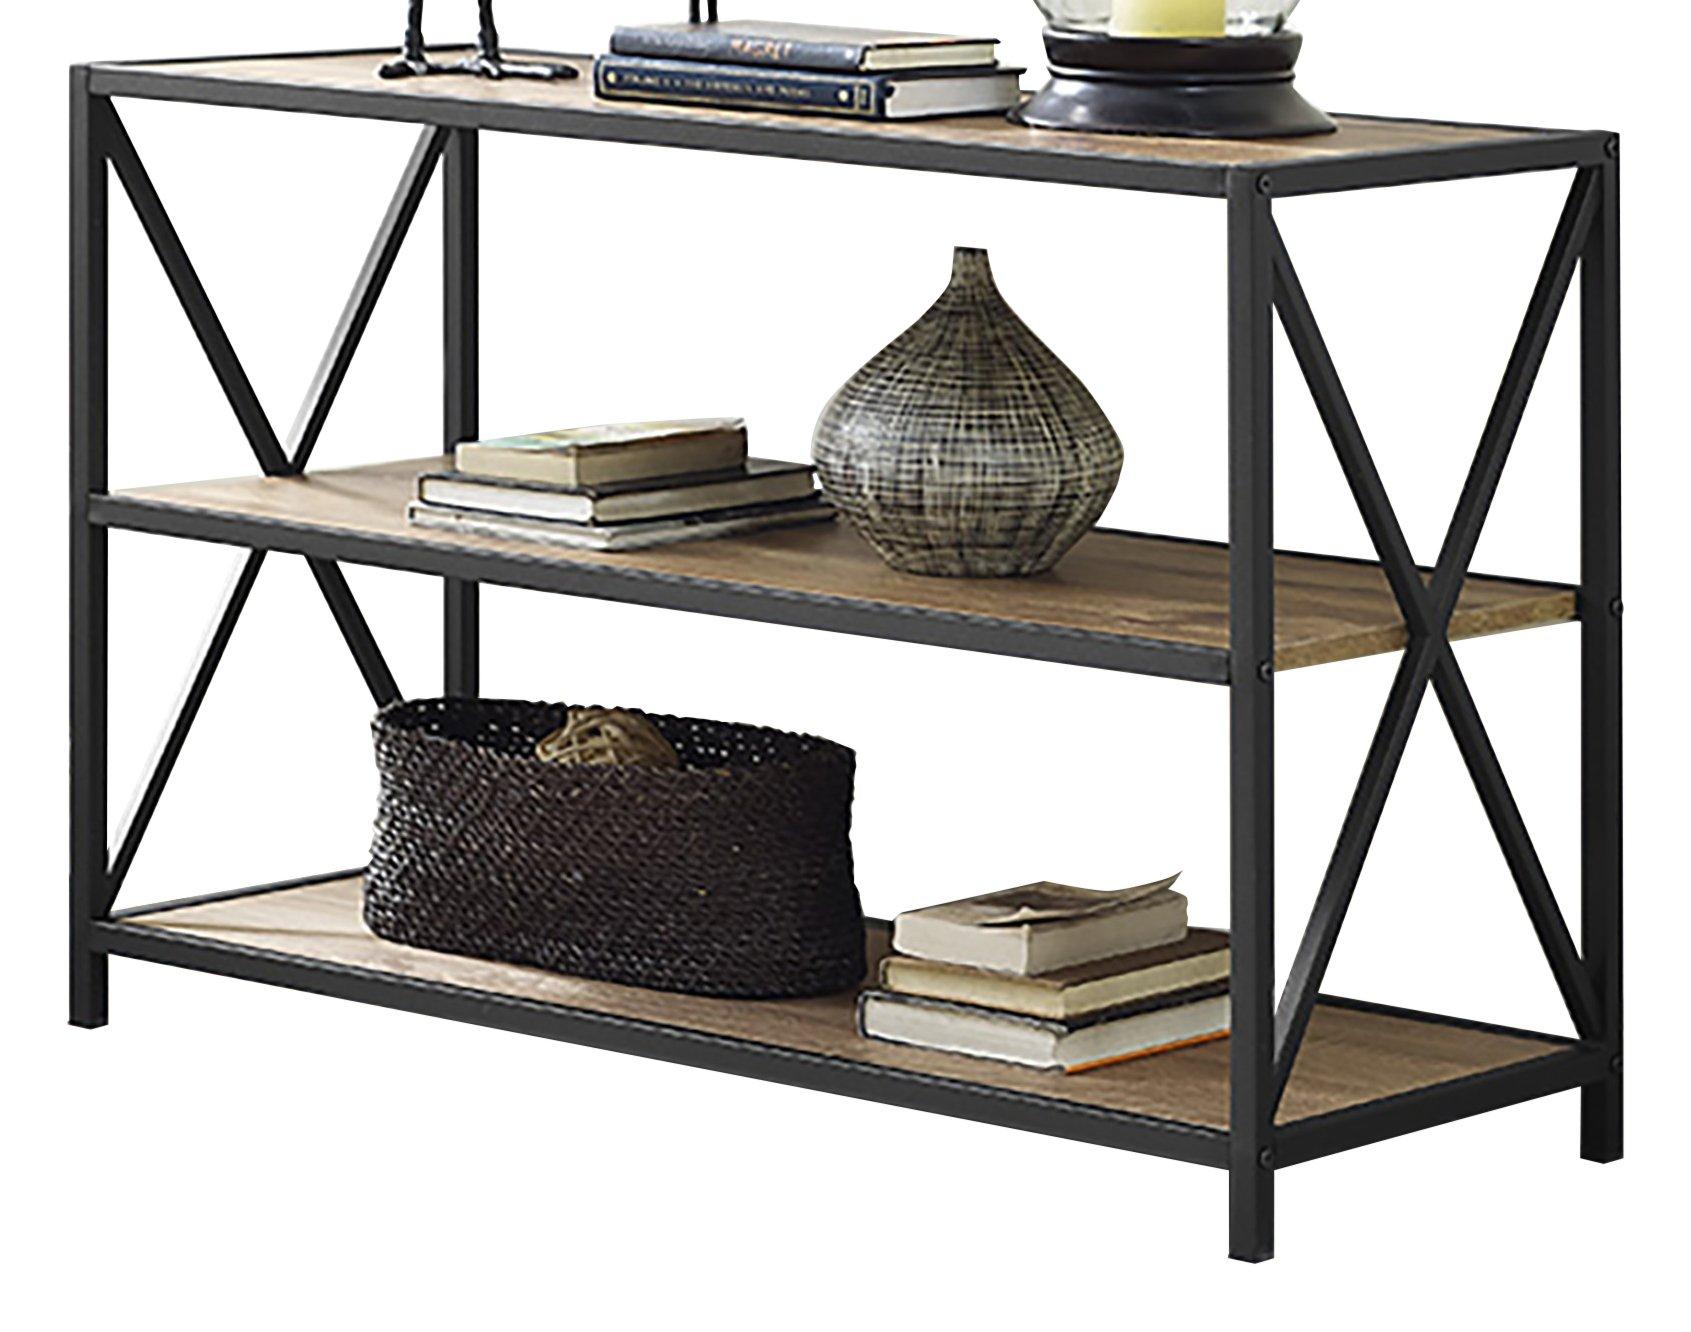 WE Furniture 40'' x-Frame Metal & Wood Media Bookshelf - Barnwood, 40'',